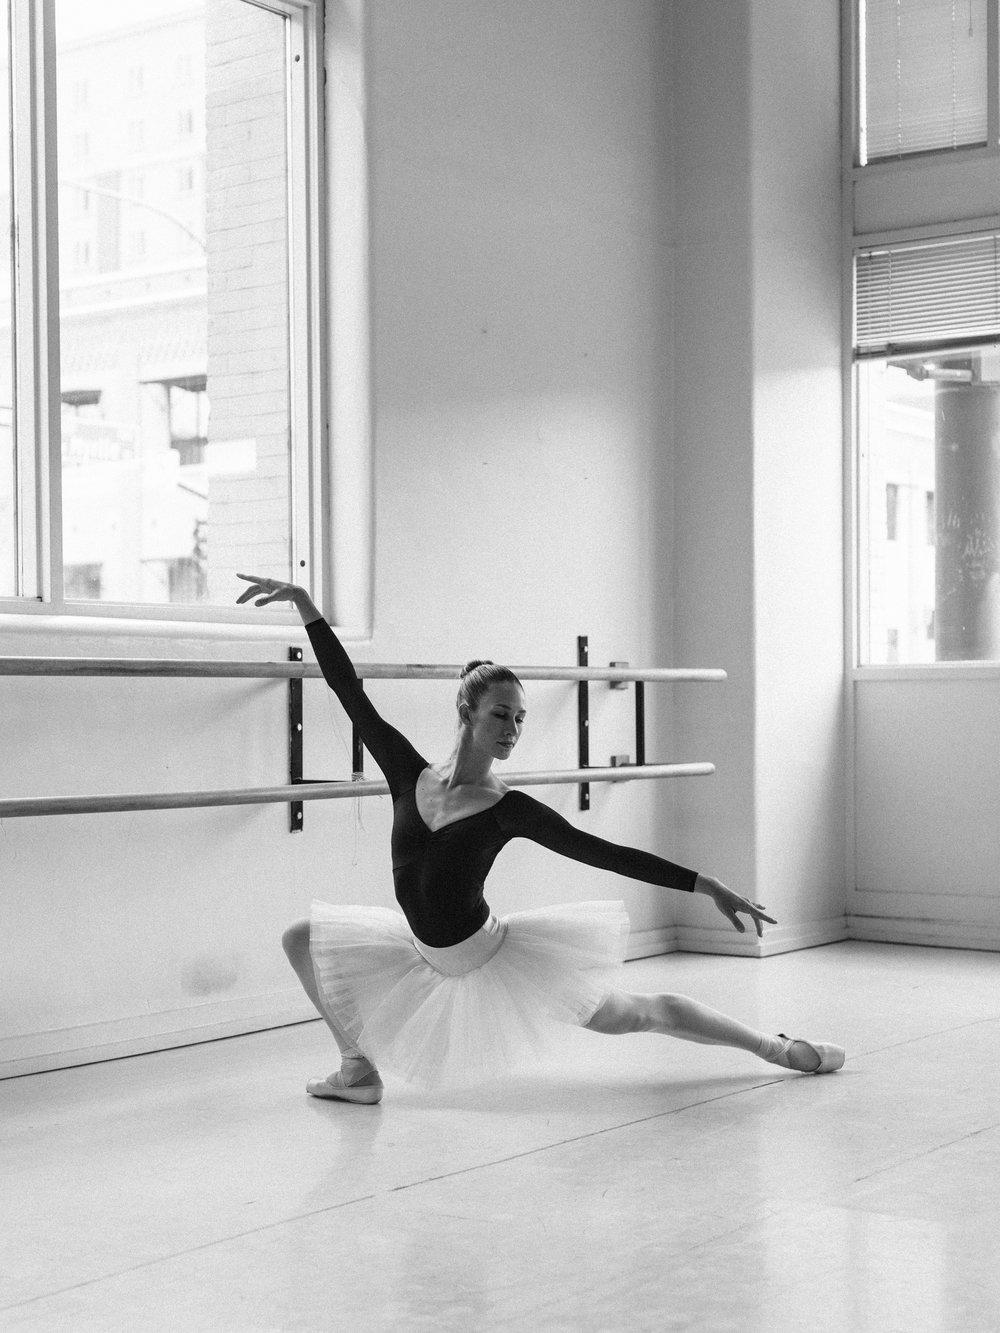 Jessica_Ballet-6.JPG